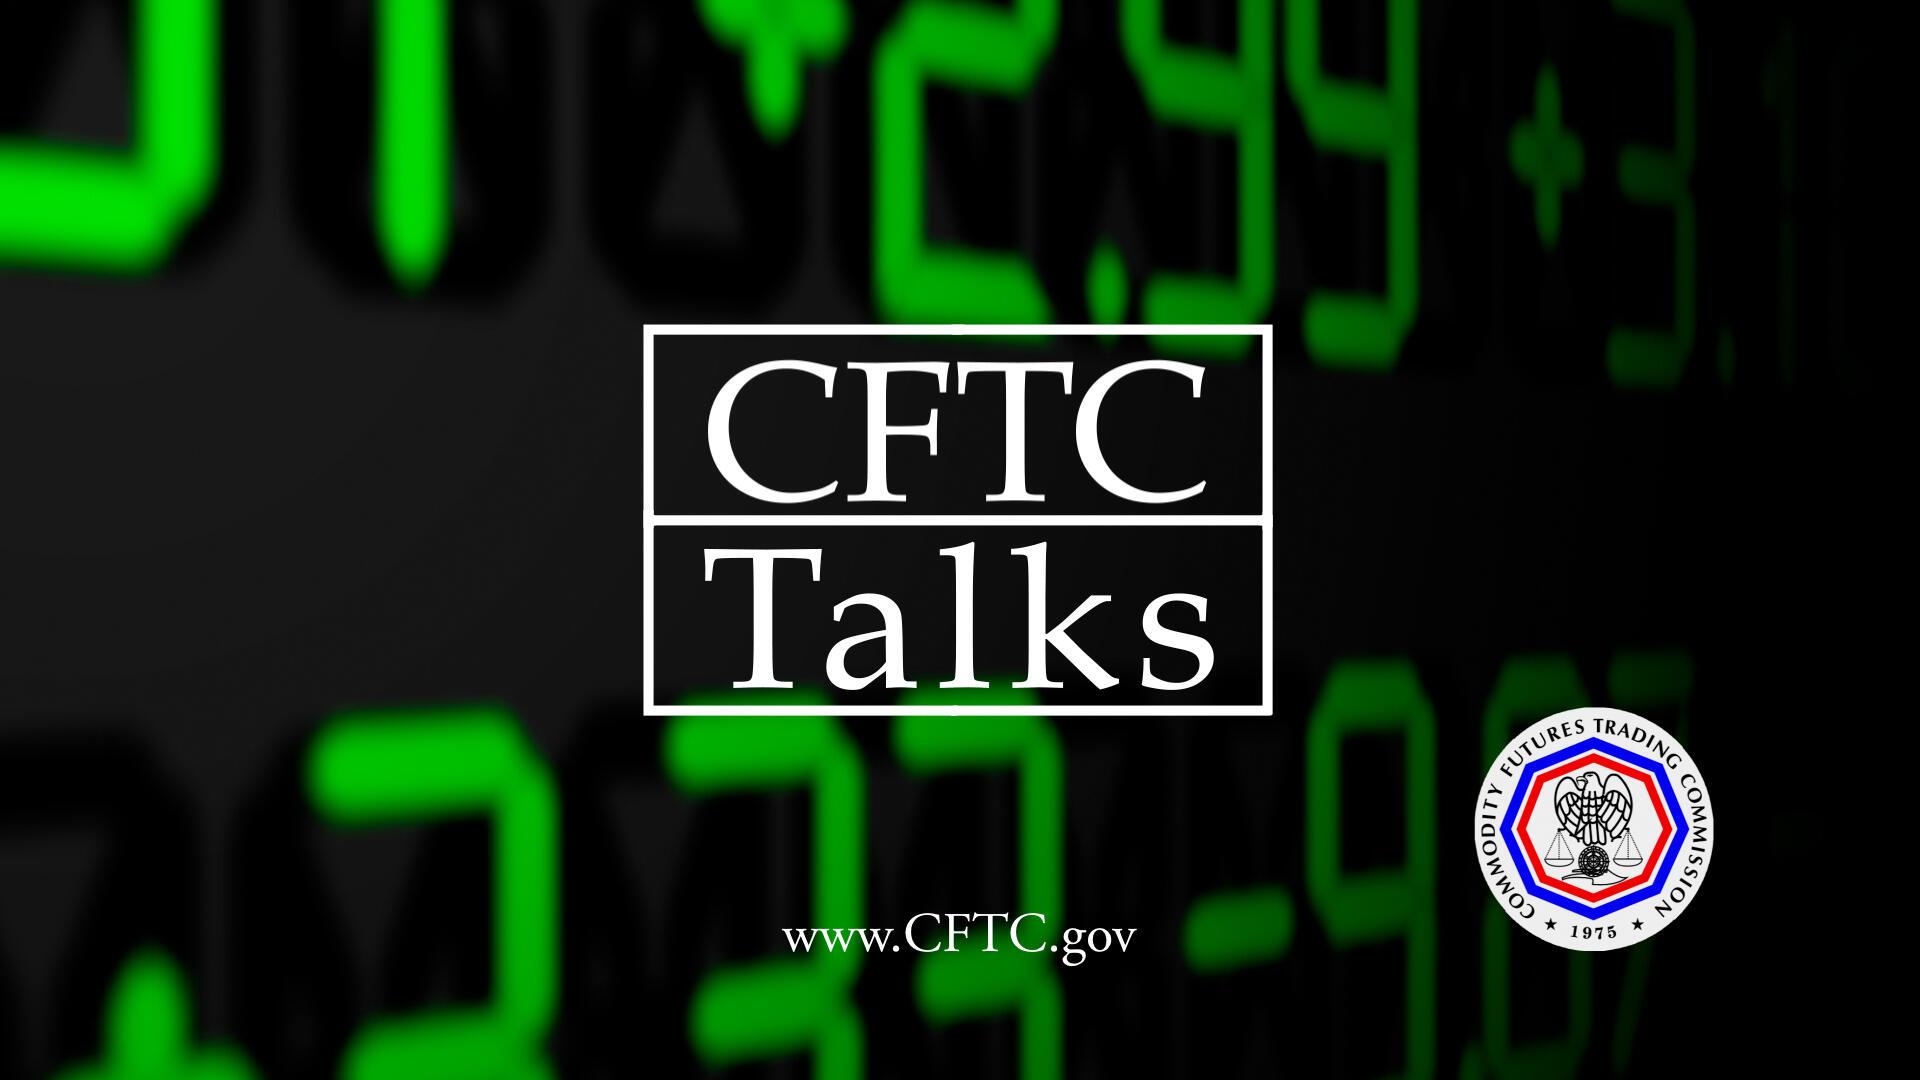 Listen to the CFTC Talks Episode - CFTC Talks EP053: MARK YALLOP